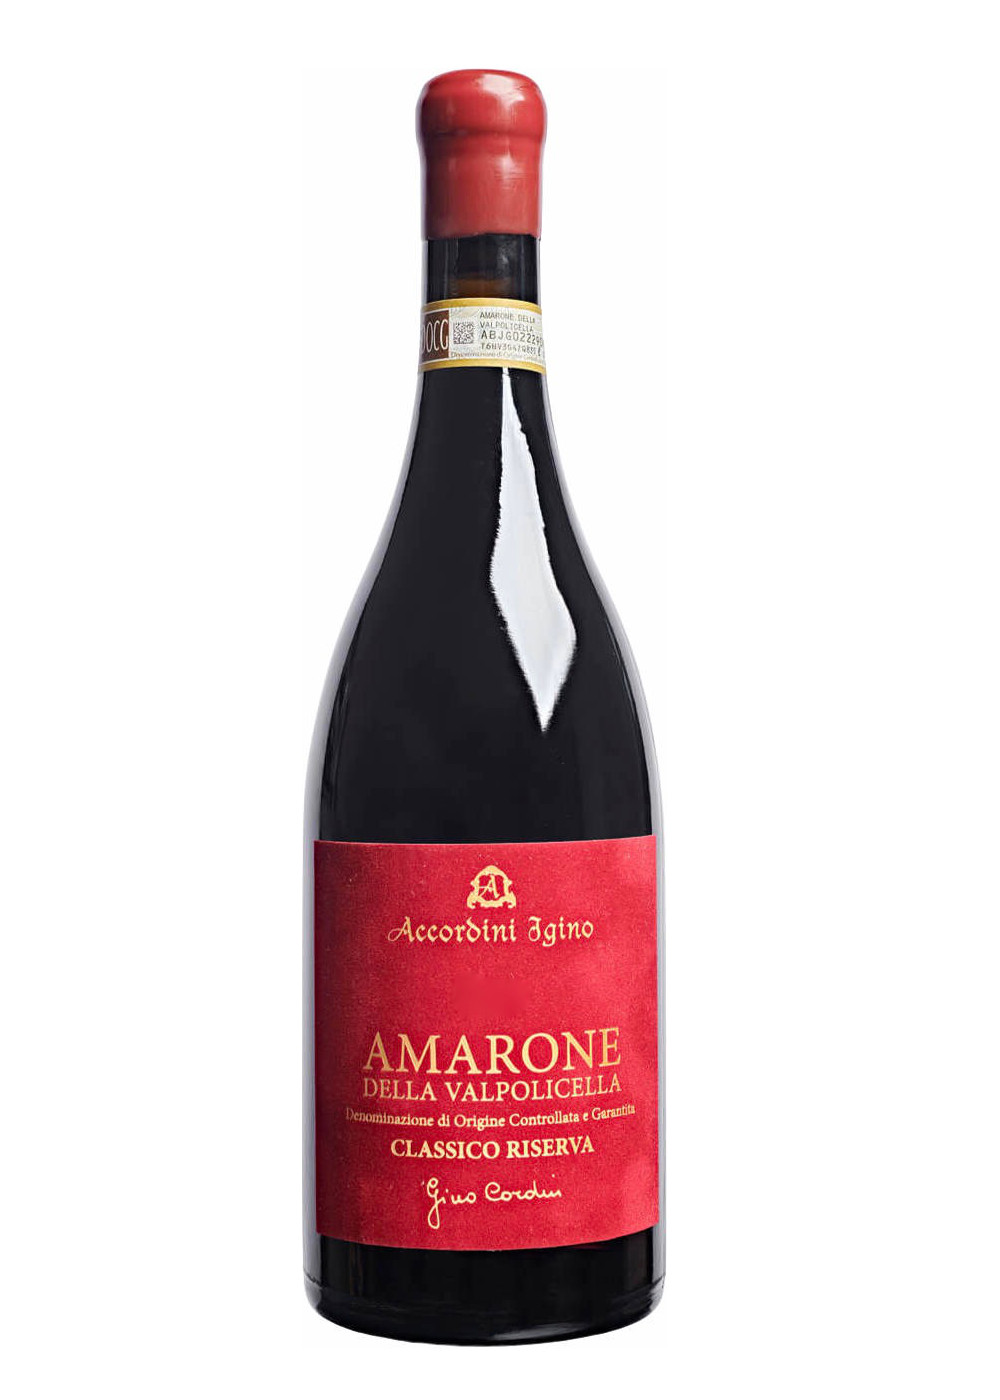 Amarone Riserva, Accordini Igino